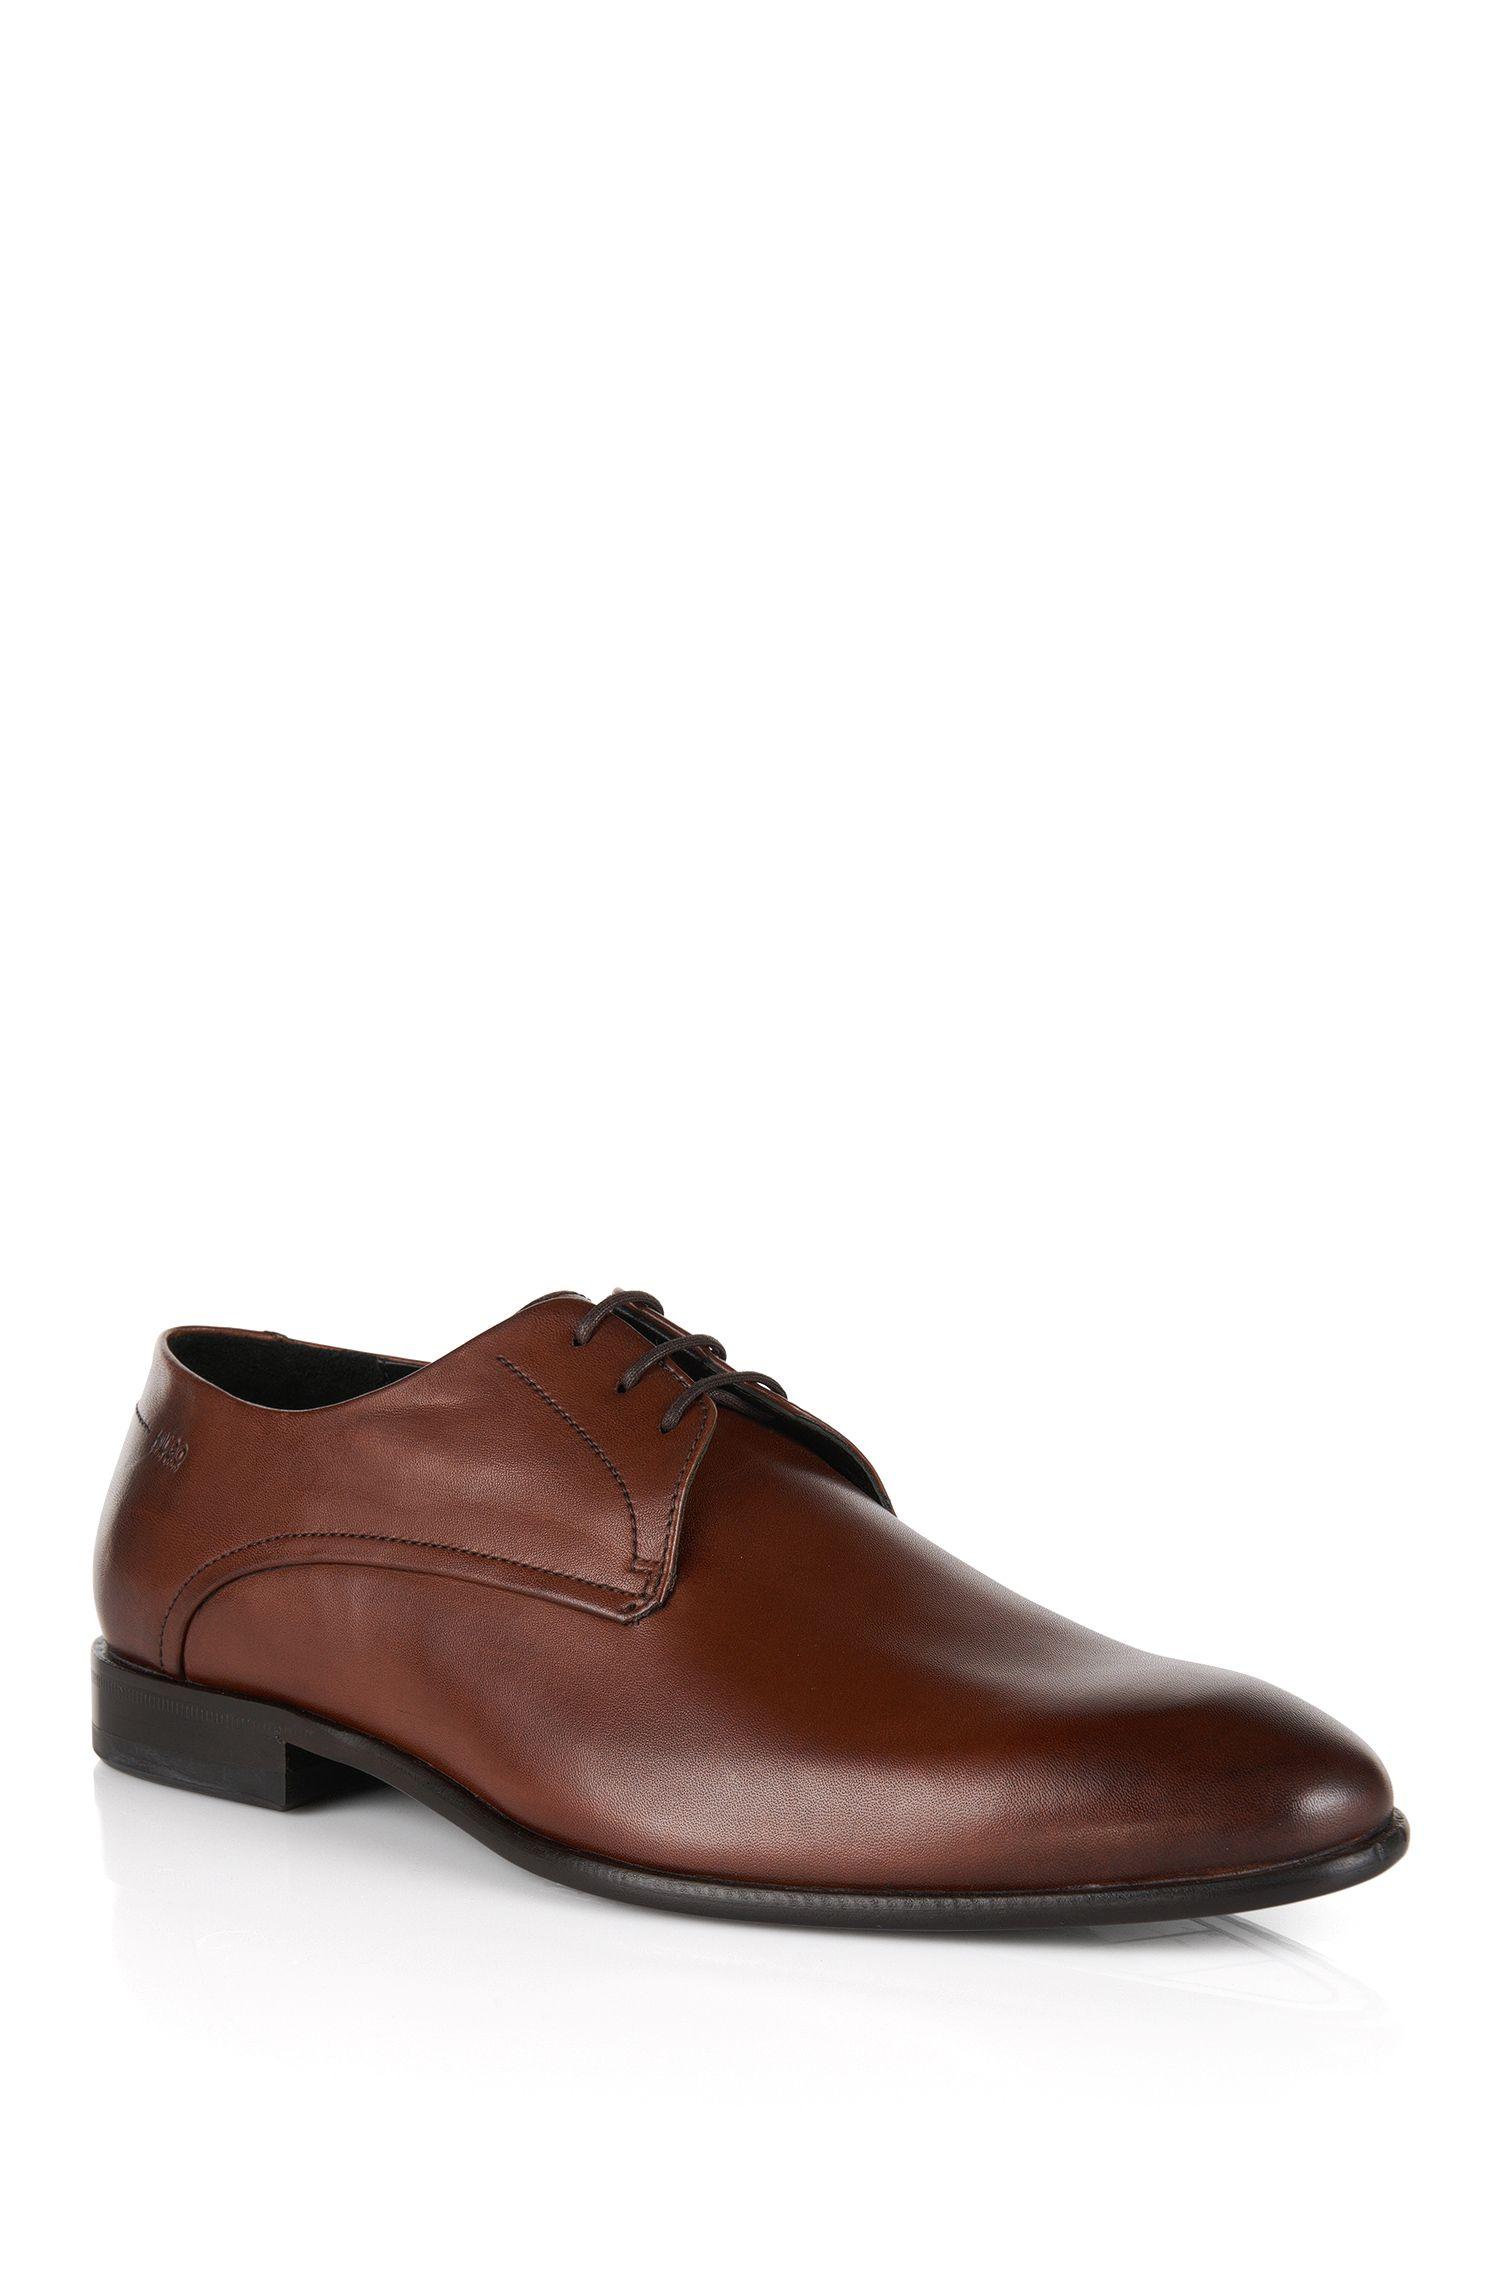 Leather Derby Dress Shoe | C-Dresios